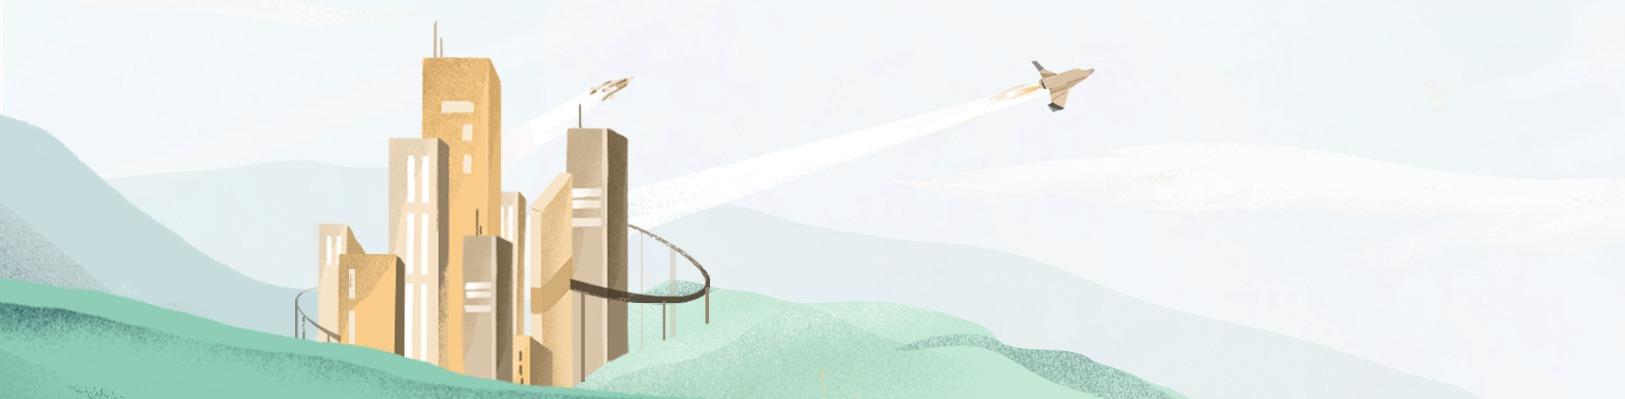 Bundl 4 myths Innovation infographic